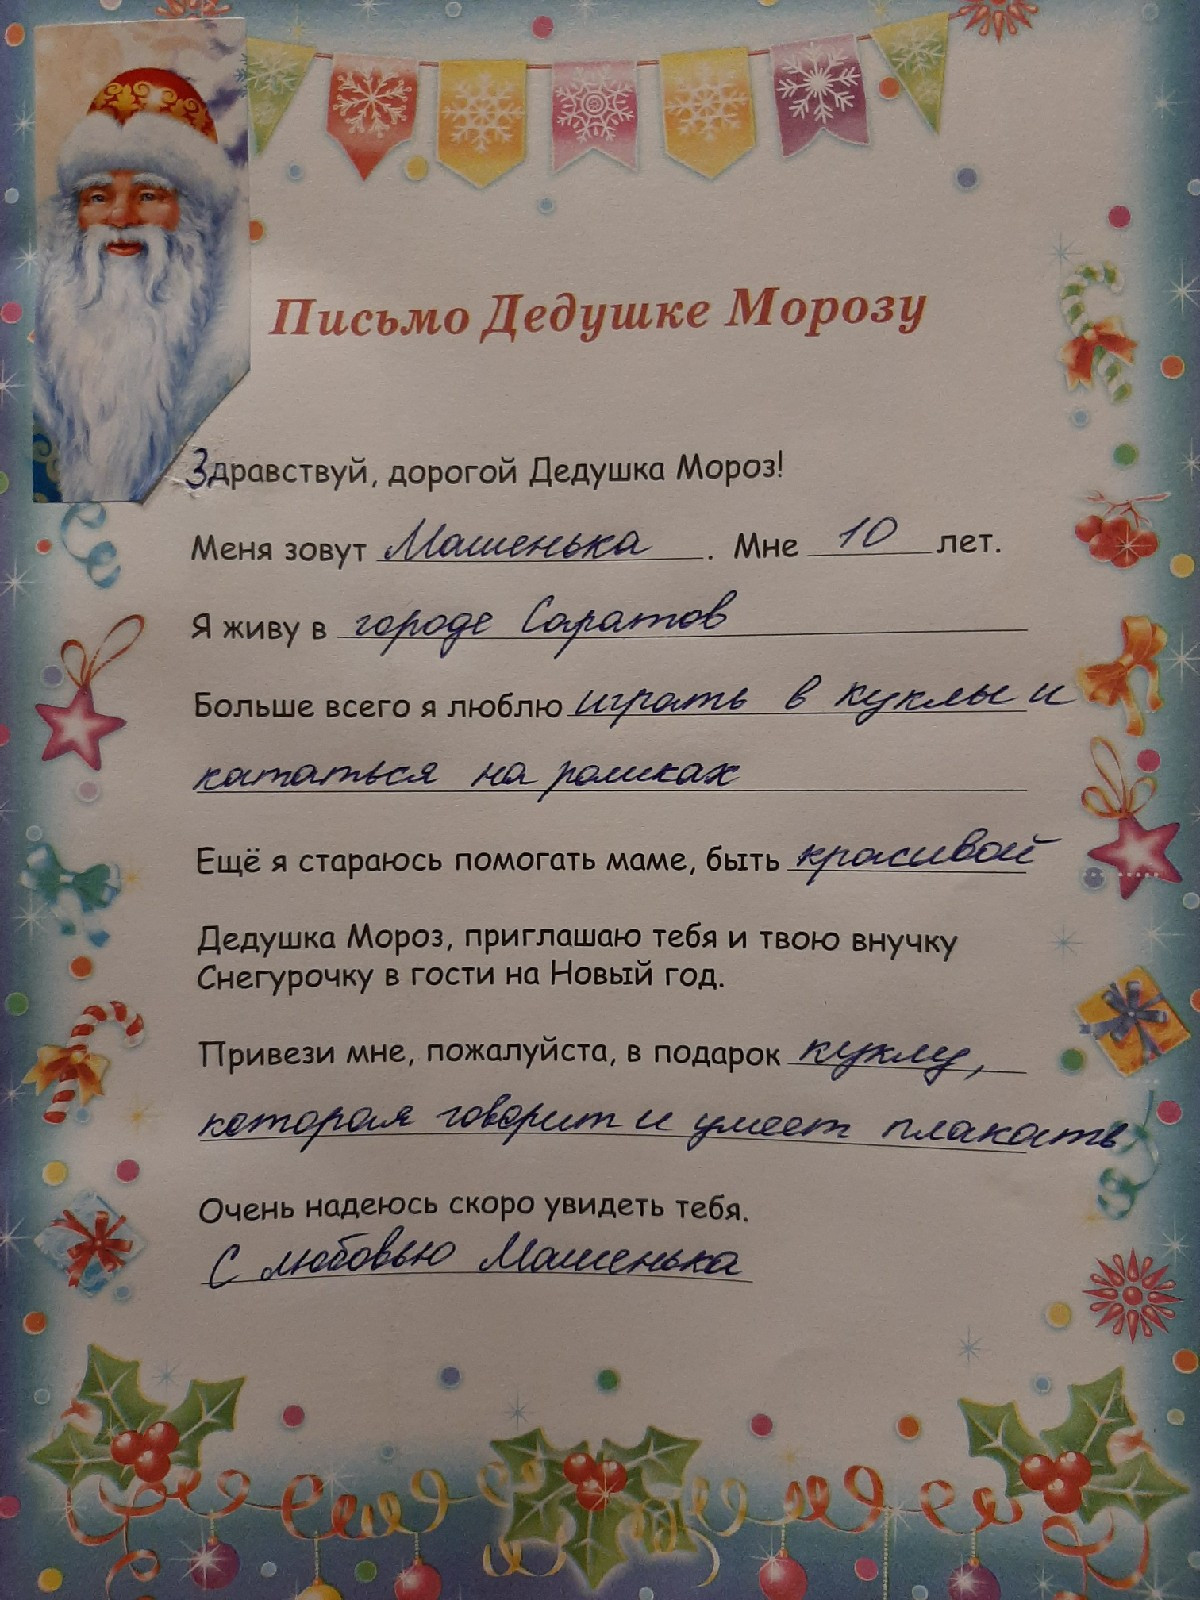 дорогой дедушка мороз письмо образец